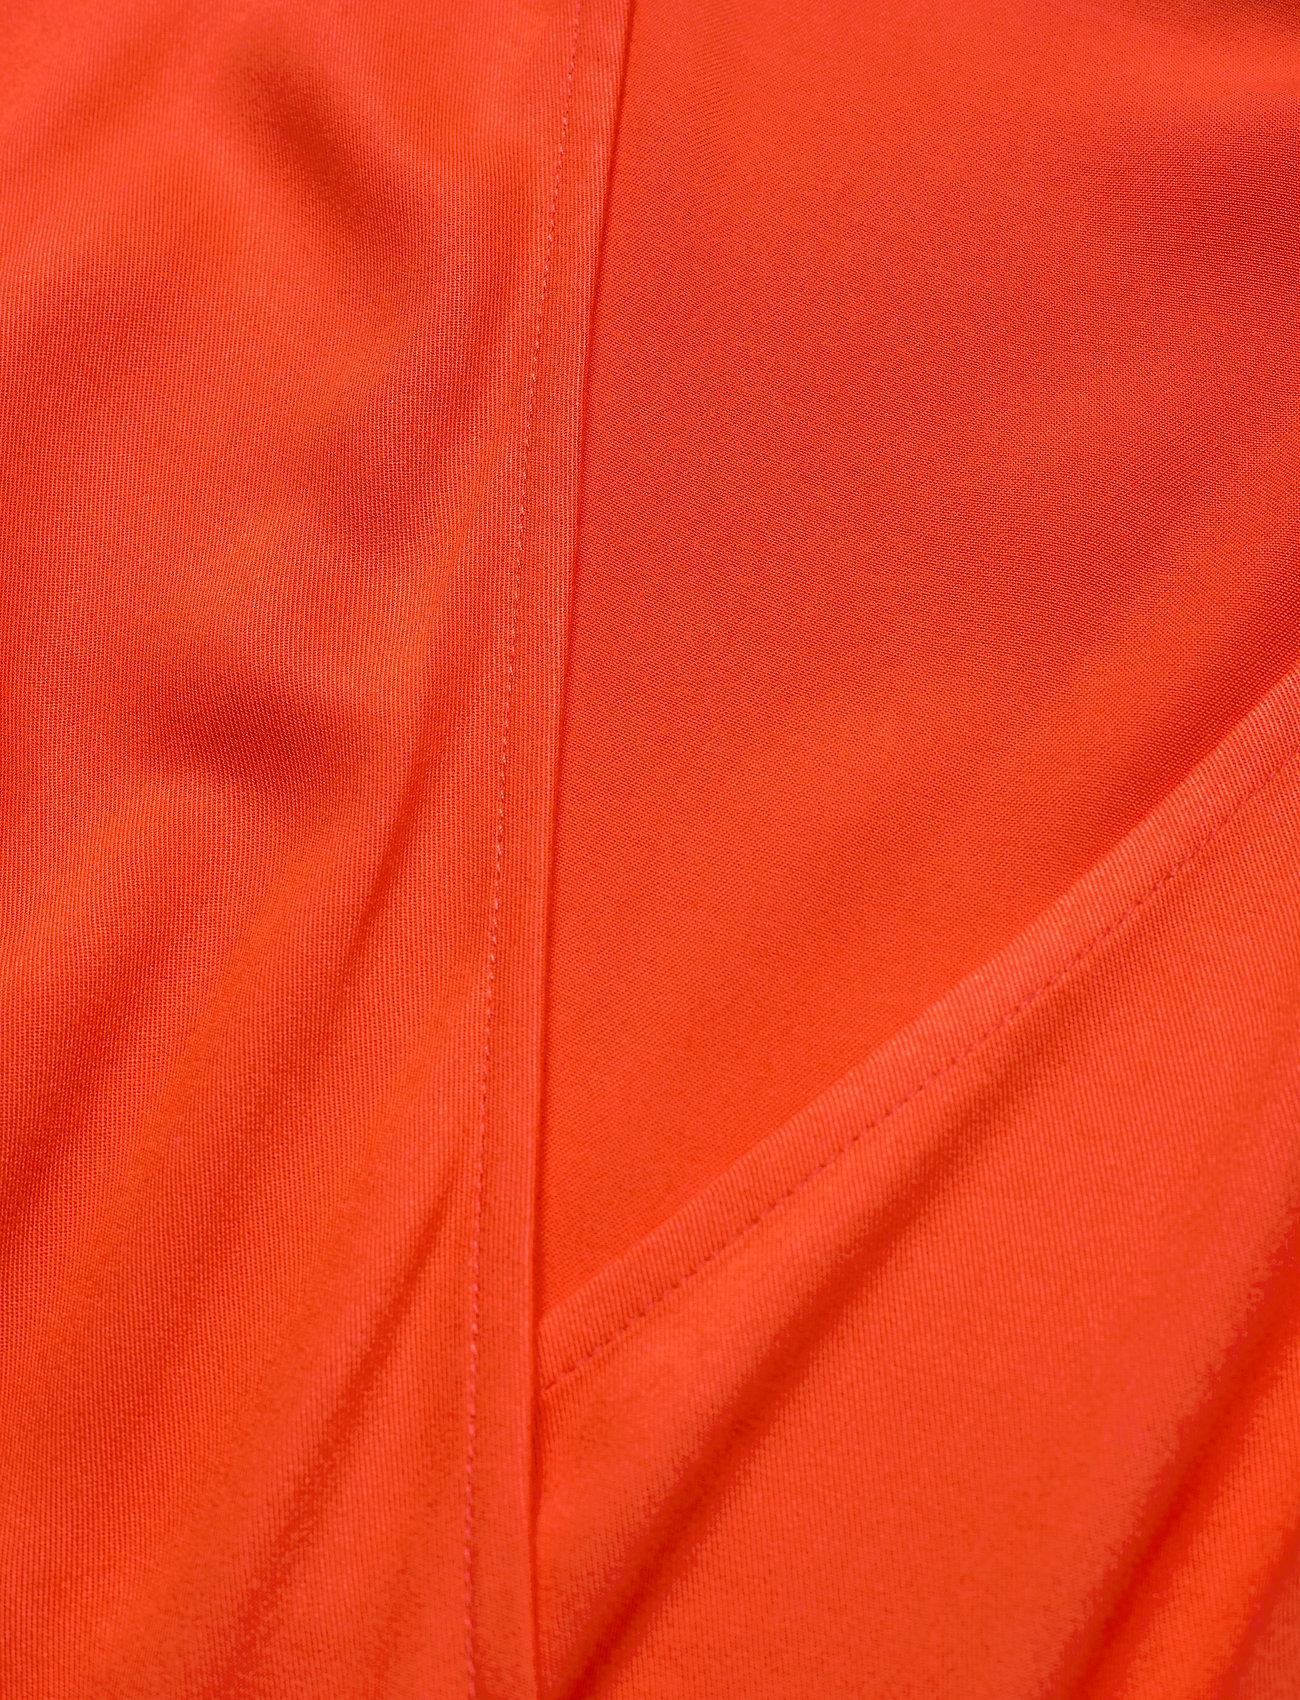 Osa Dress (Bright Red) (1331.85 kr) - Camilla Pihl